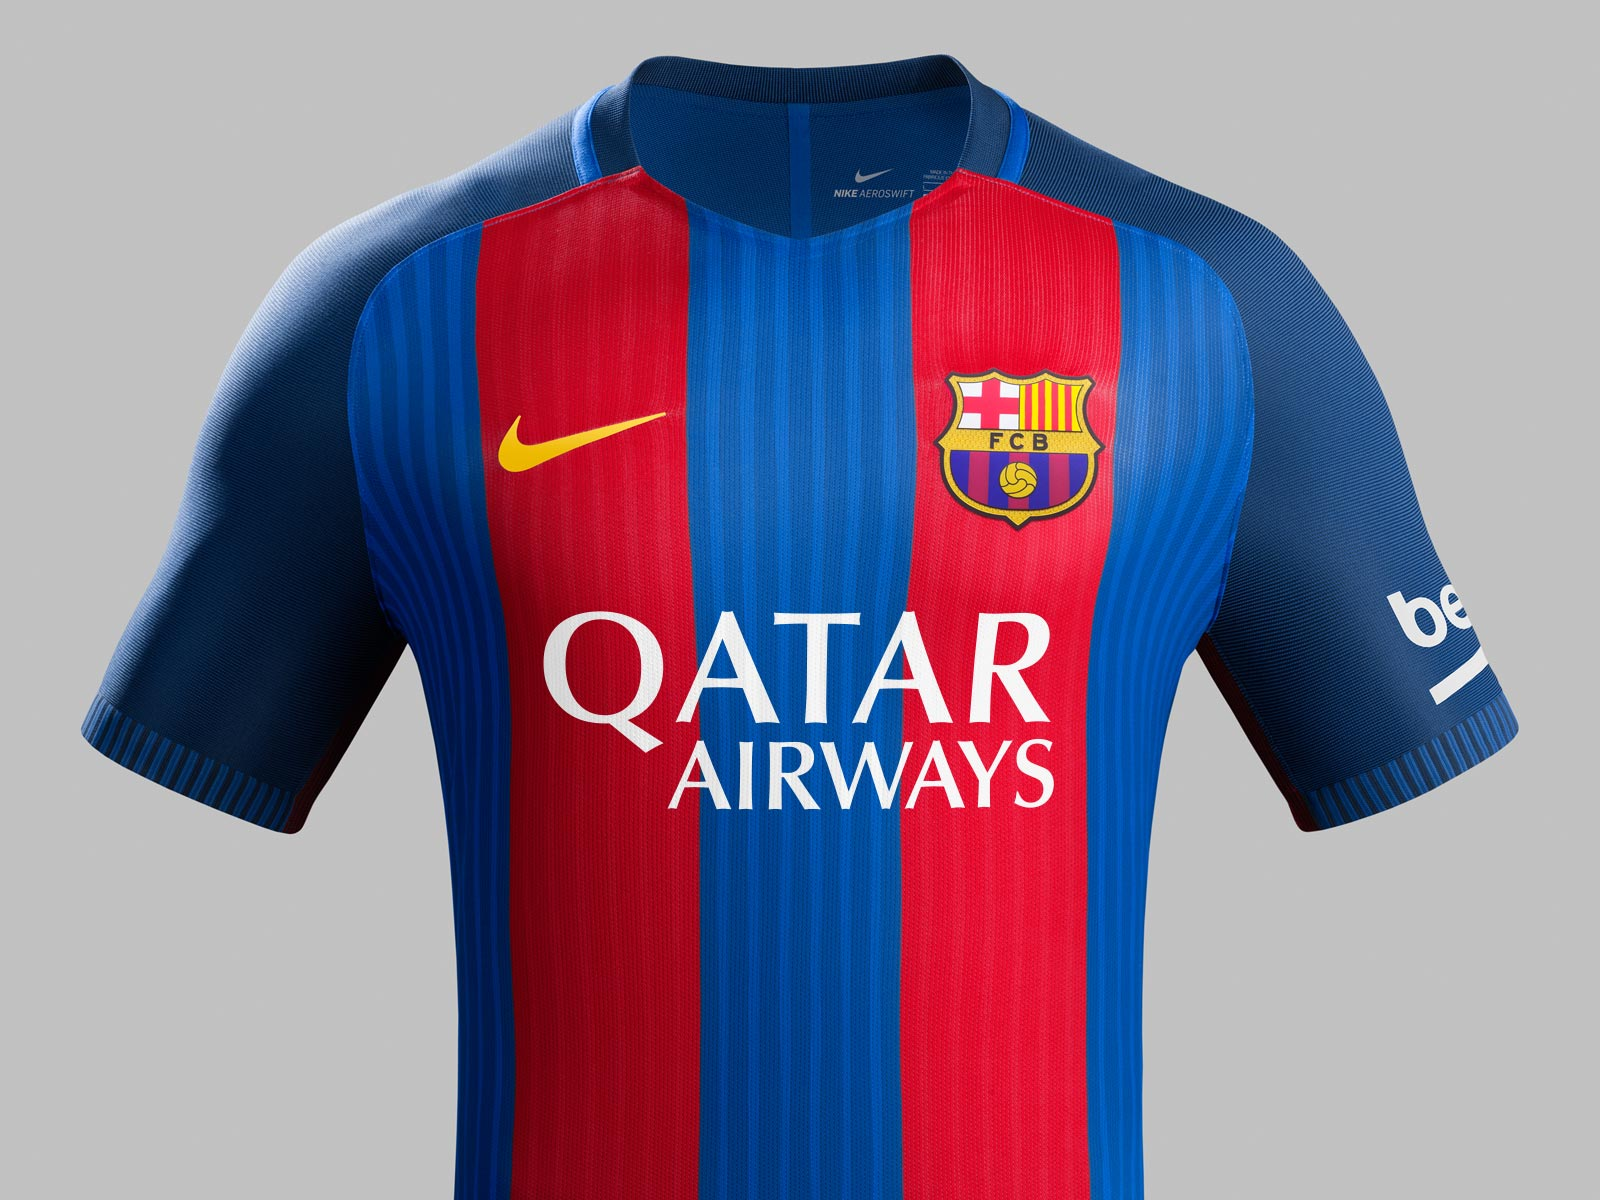 Barcelona to Announce New Qatar Airways Sponsorship Deal